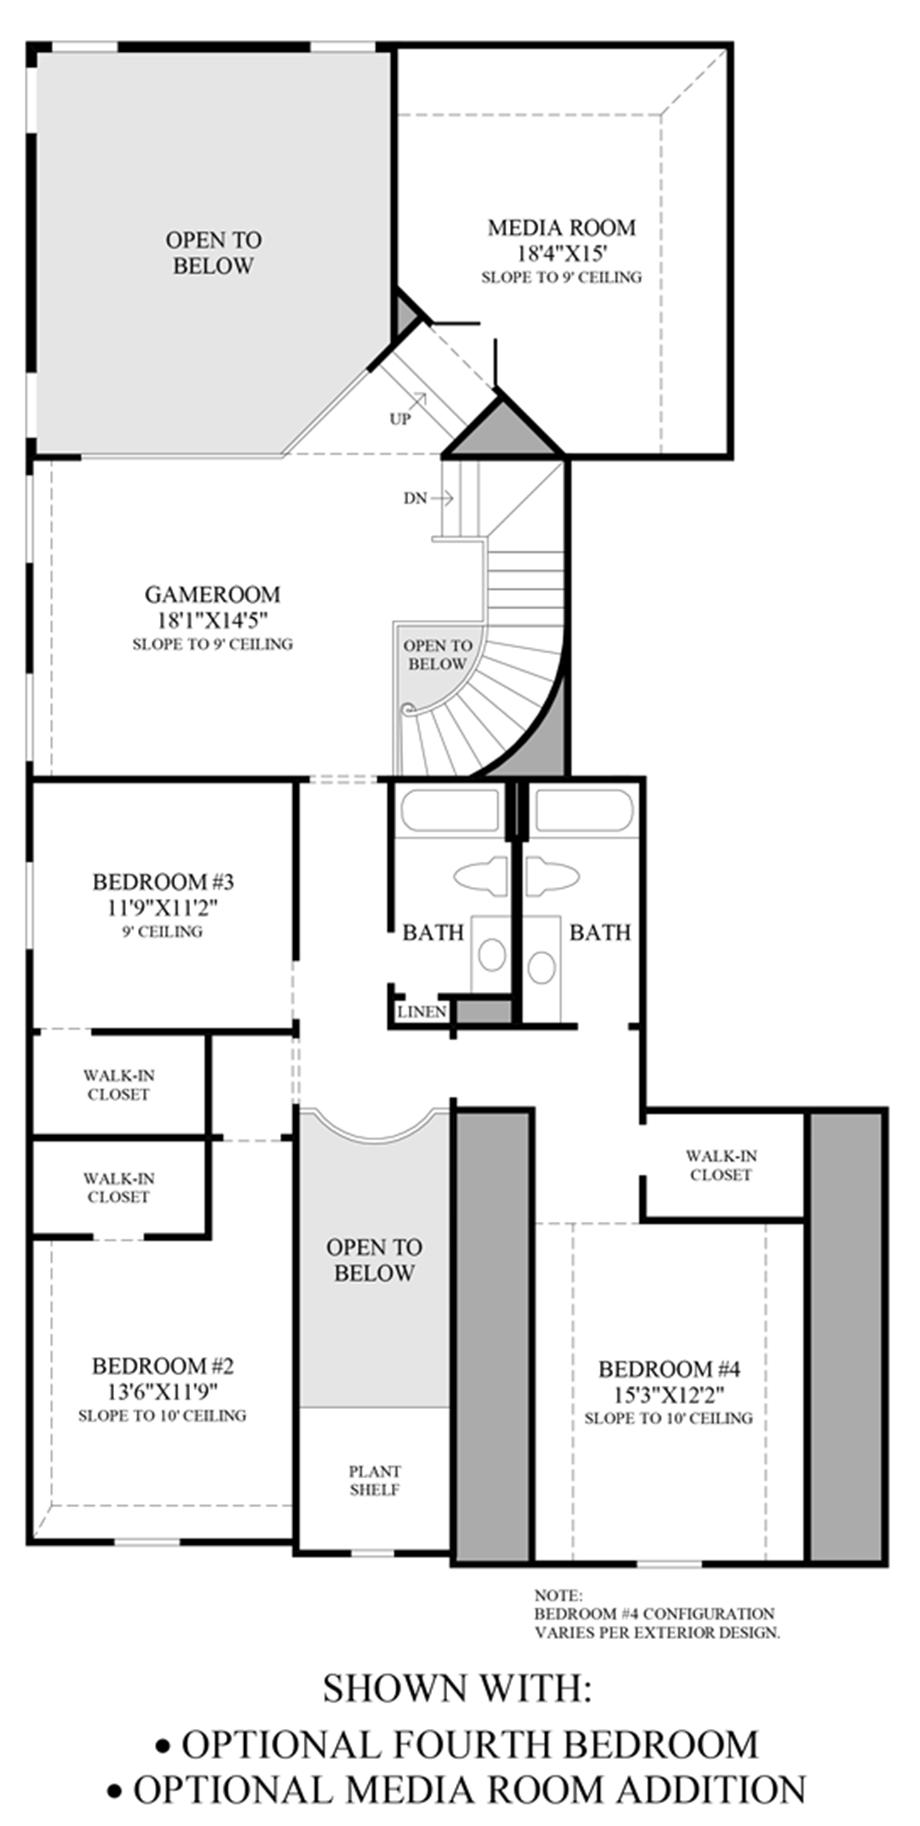 Optional 4th Bedroom & Media Room Addition Floor Plan